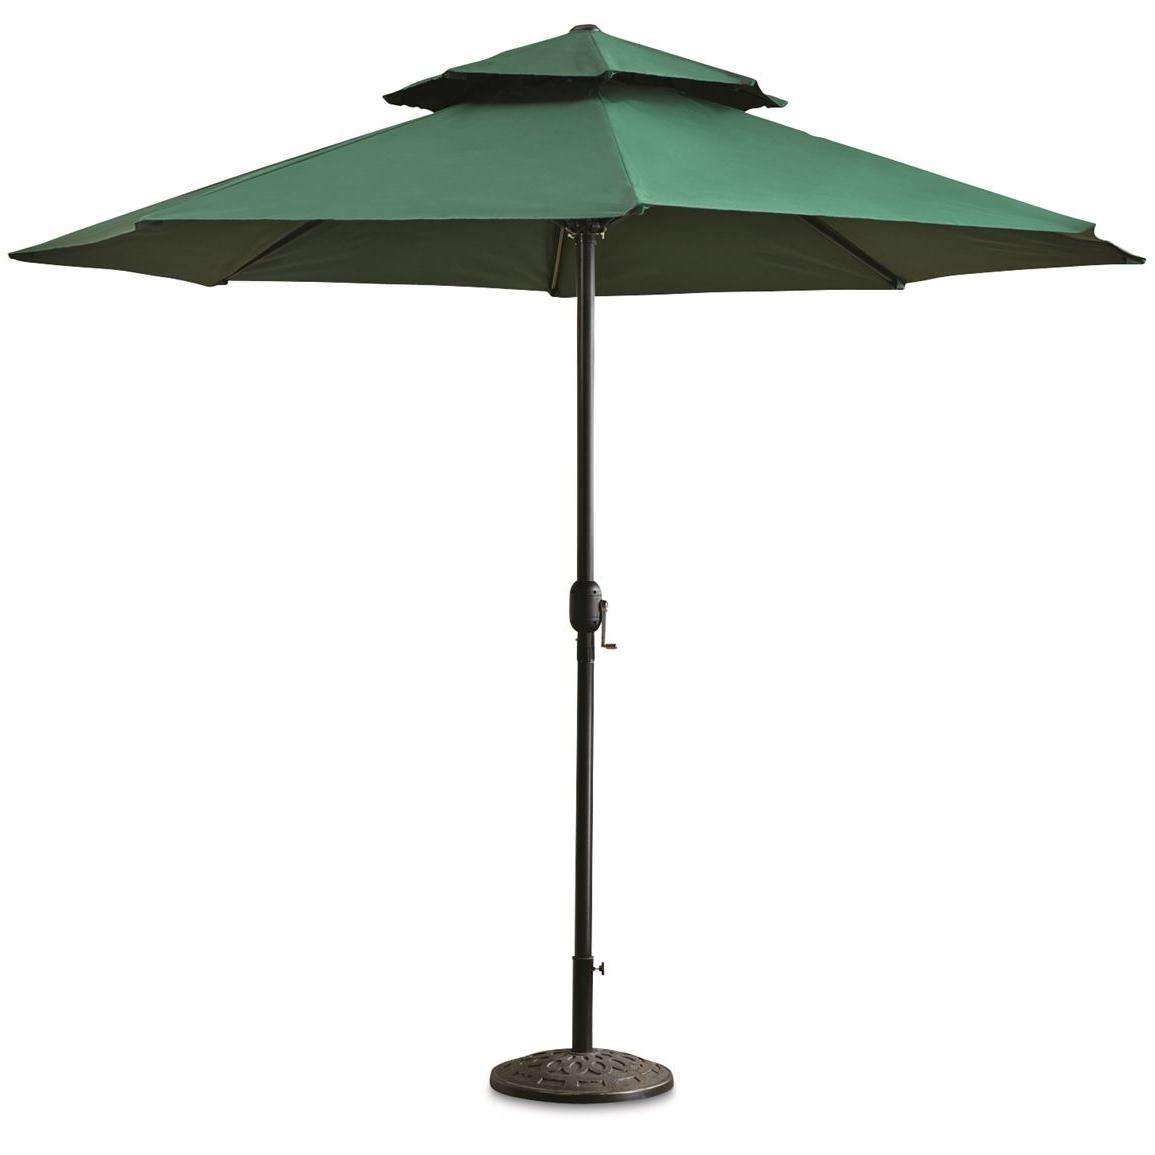 Castlecreek 10' Double Layer Patio Umbrella – 678520, Patio Pertaining To Fashionable Green Patio Umbrellas (View 3 of 20)